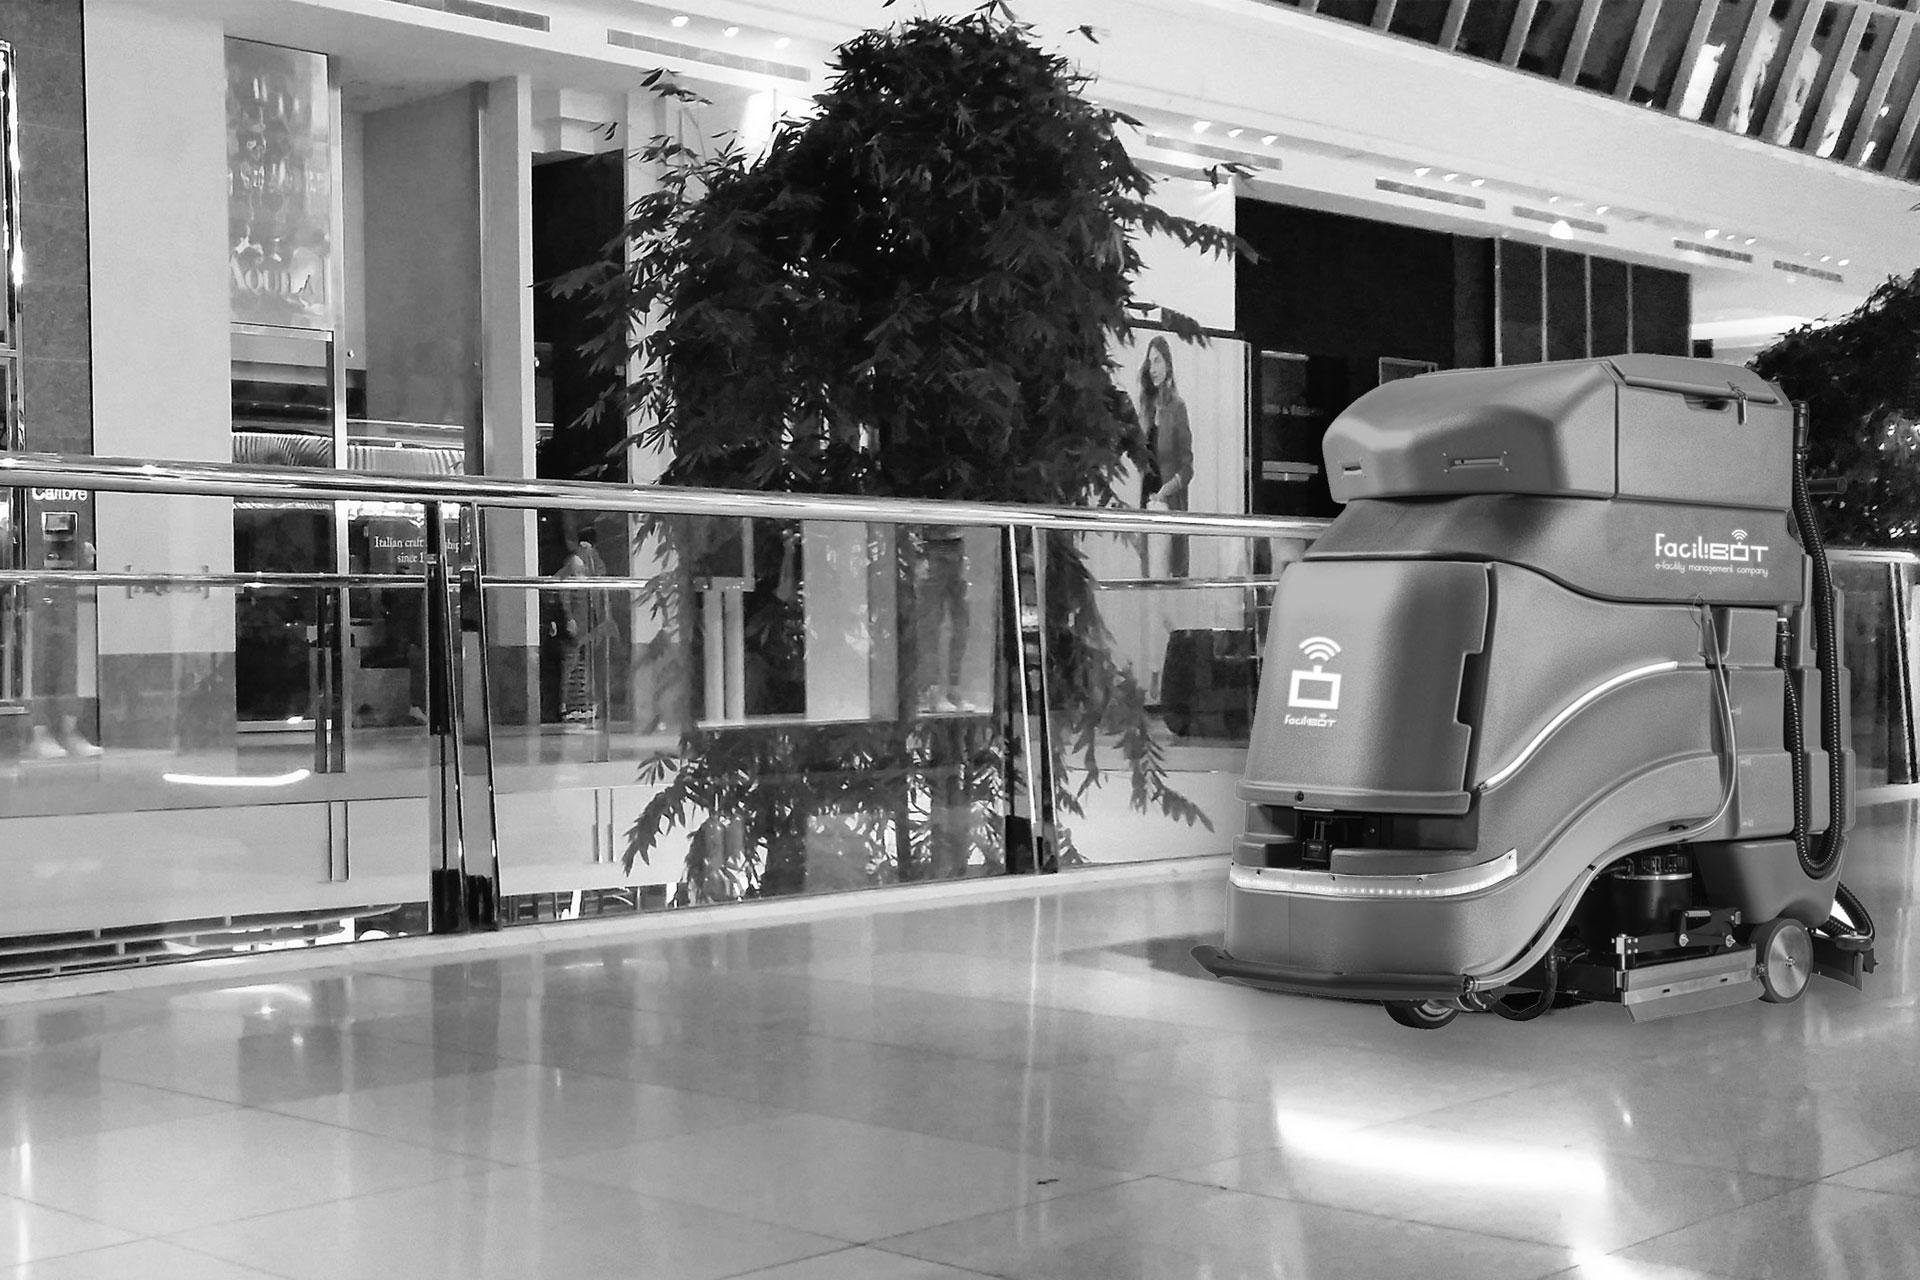 robot-neo-facilibot-azur-nettoyage-desinfection